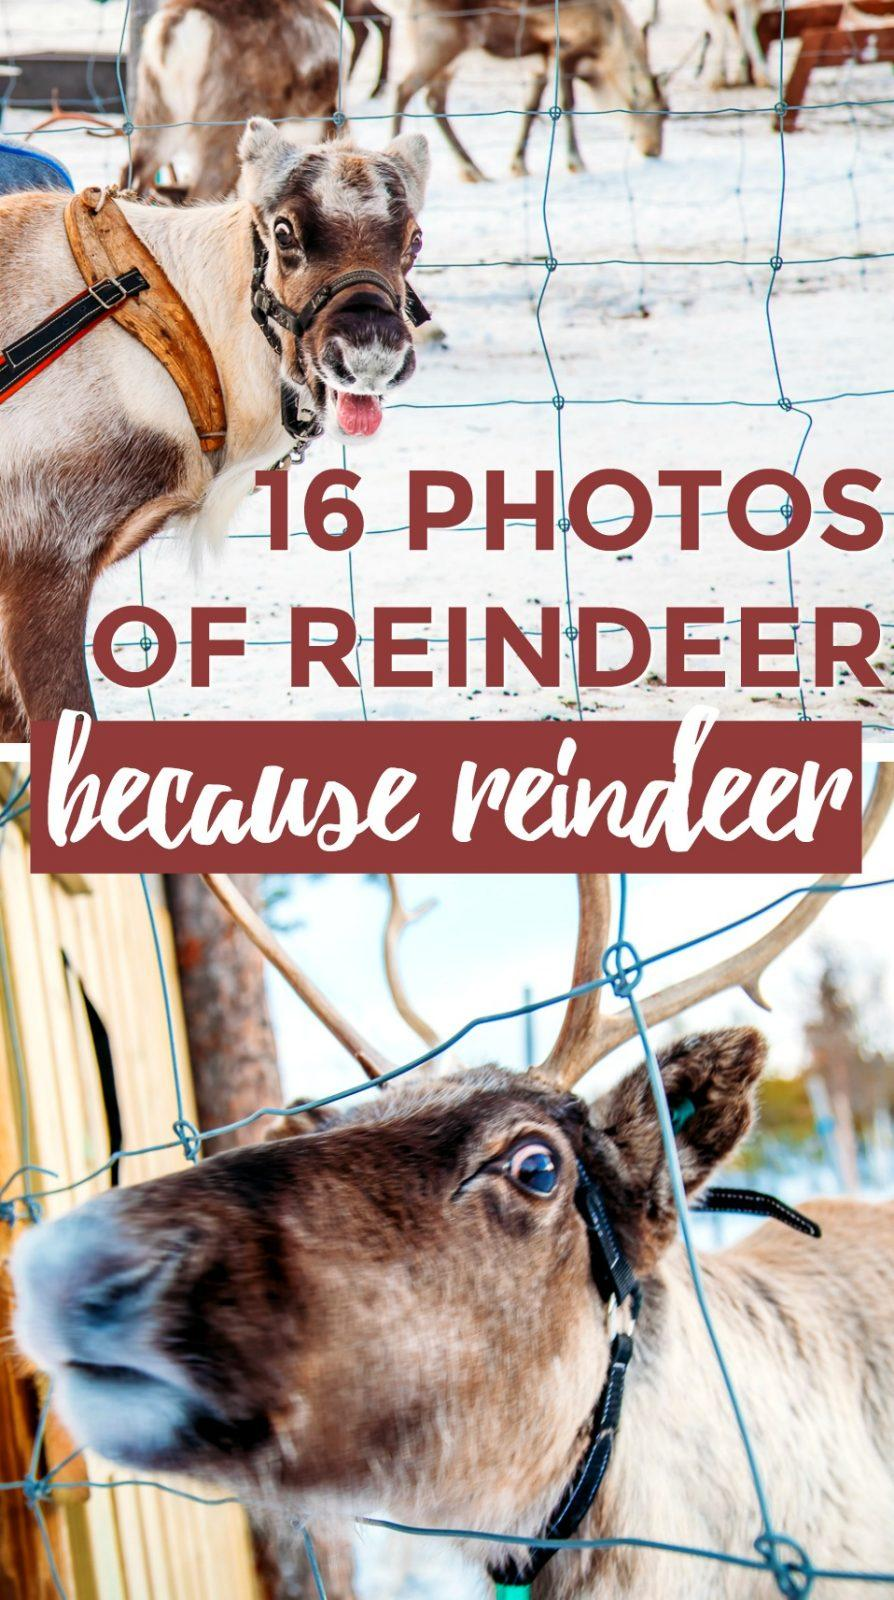 Visiting reindeer in a Sami village in Swedish Lapland - Kiruna, Sweden